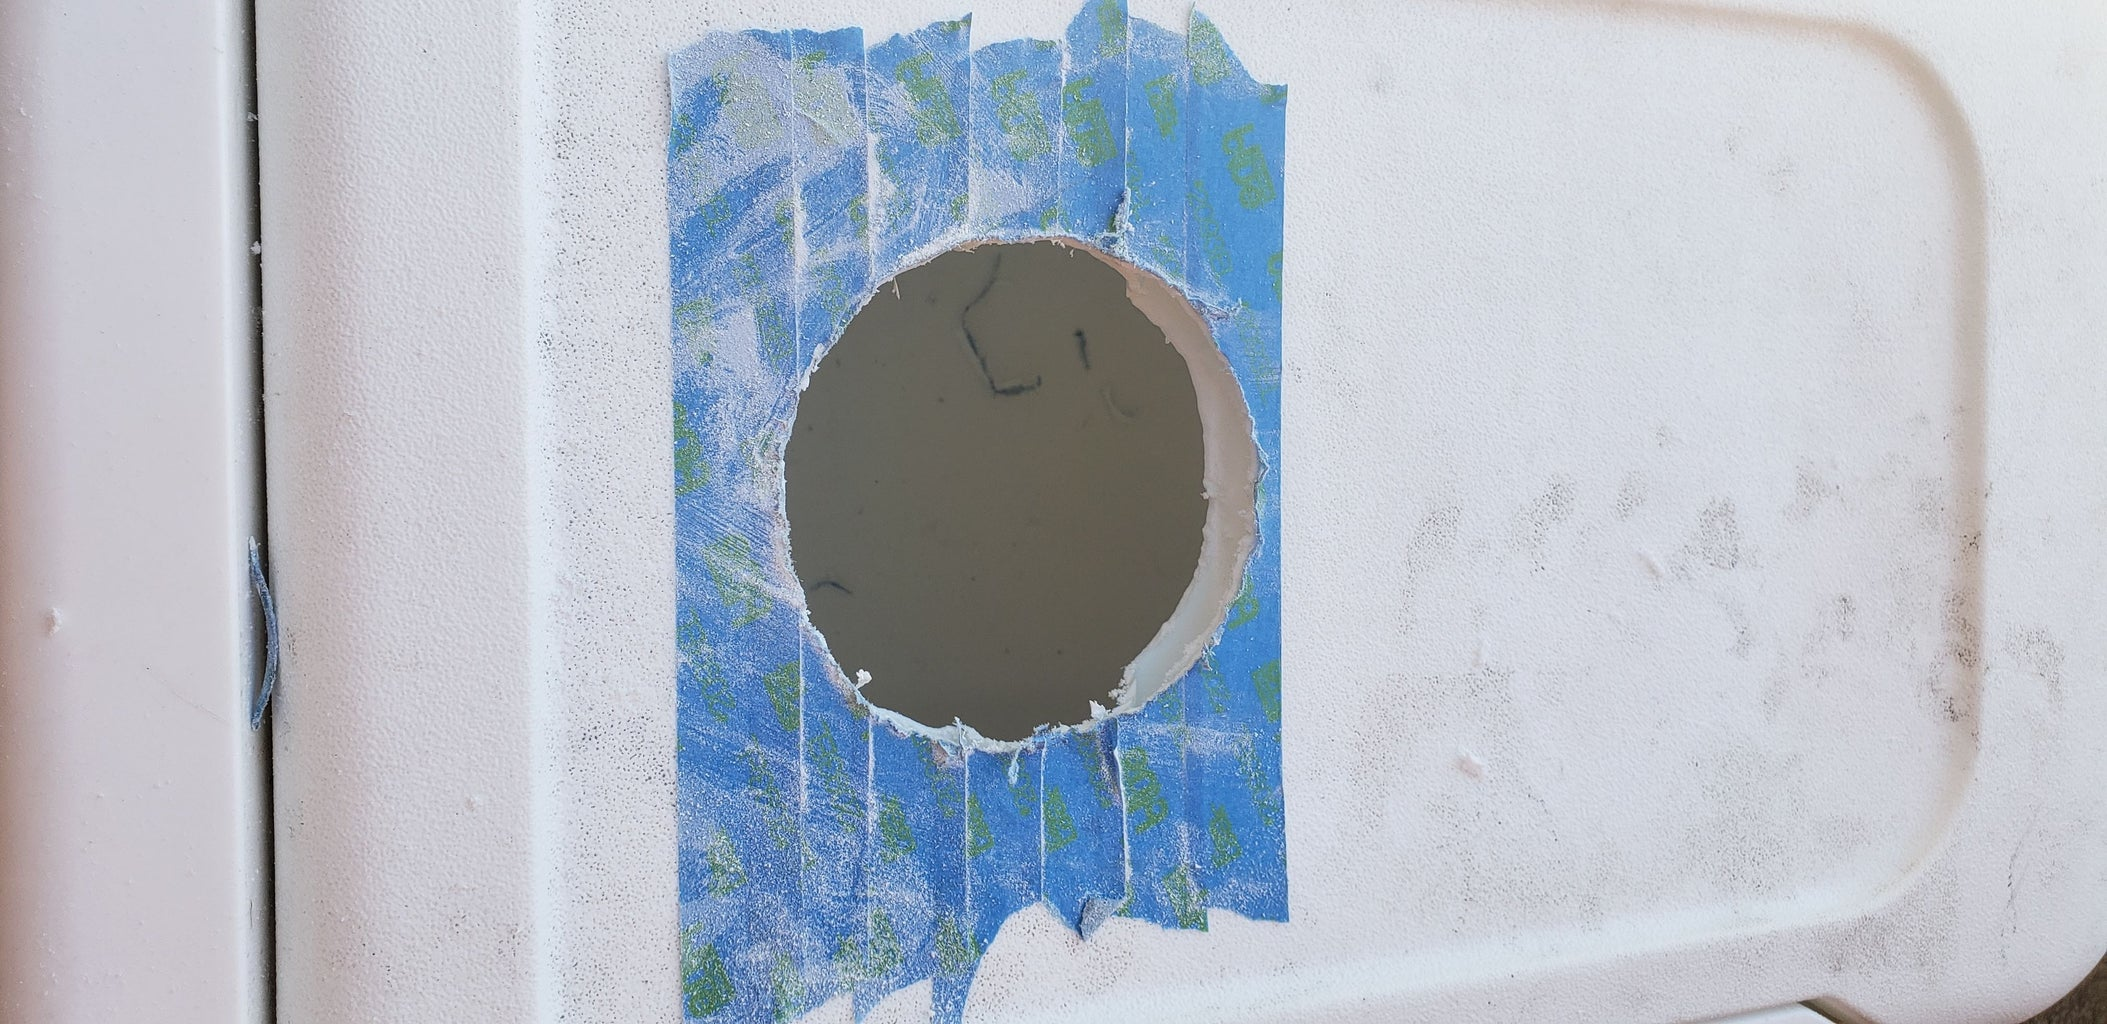 The Whole Hole